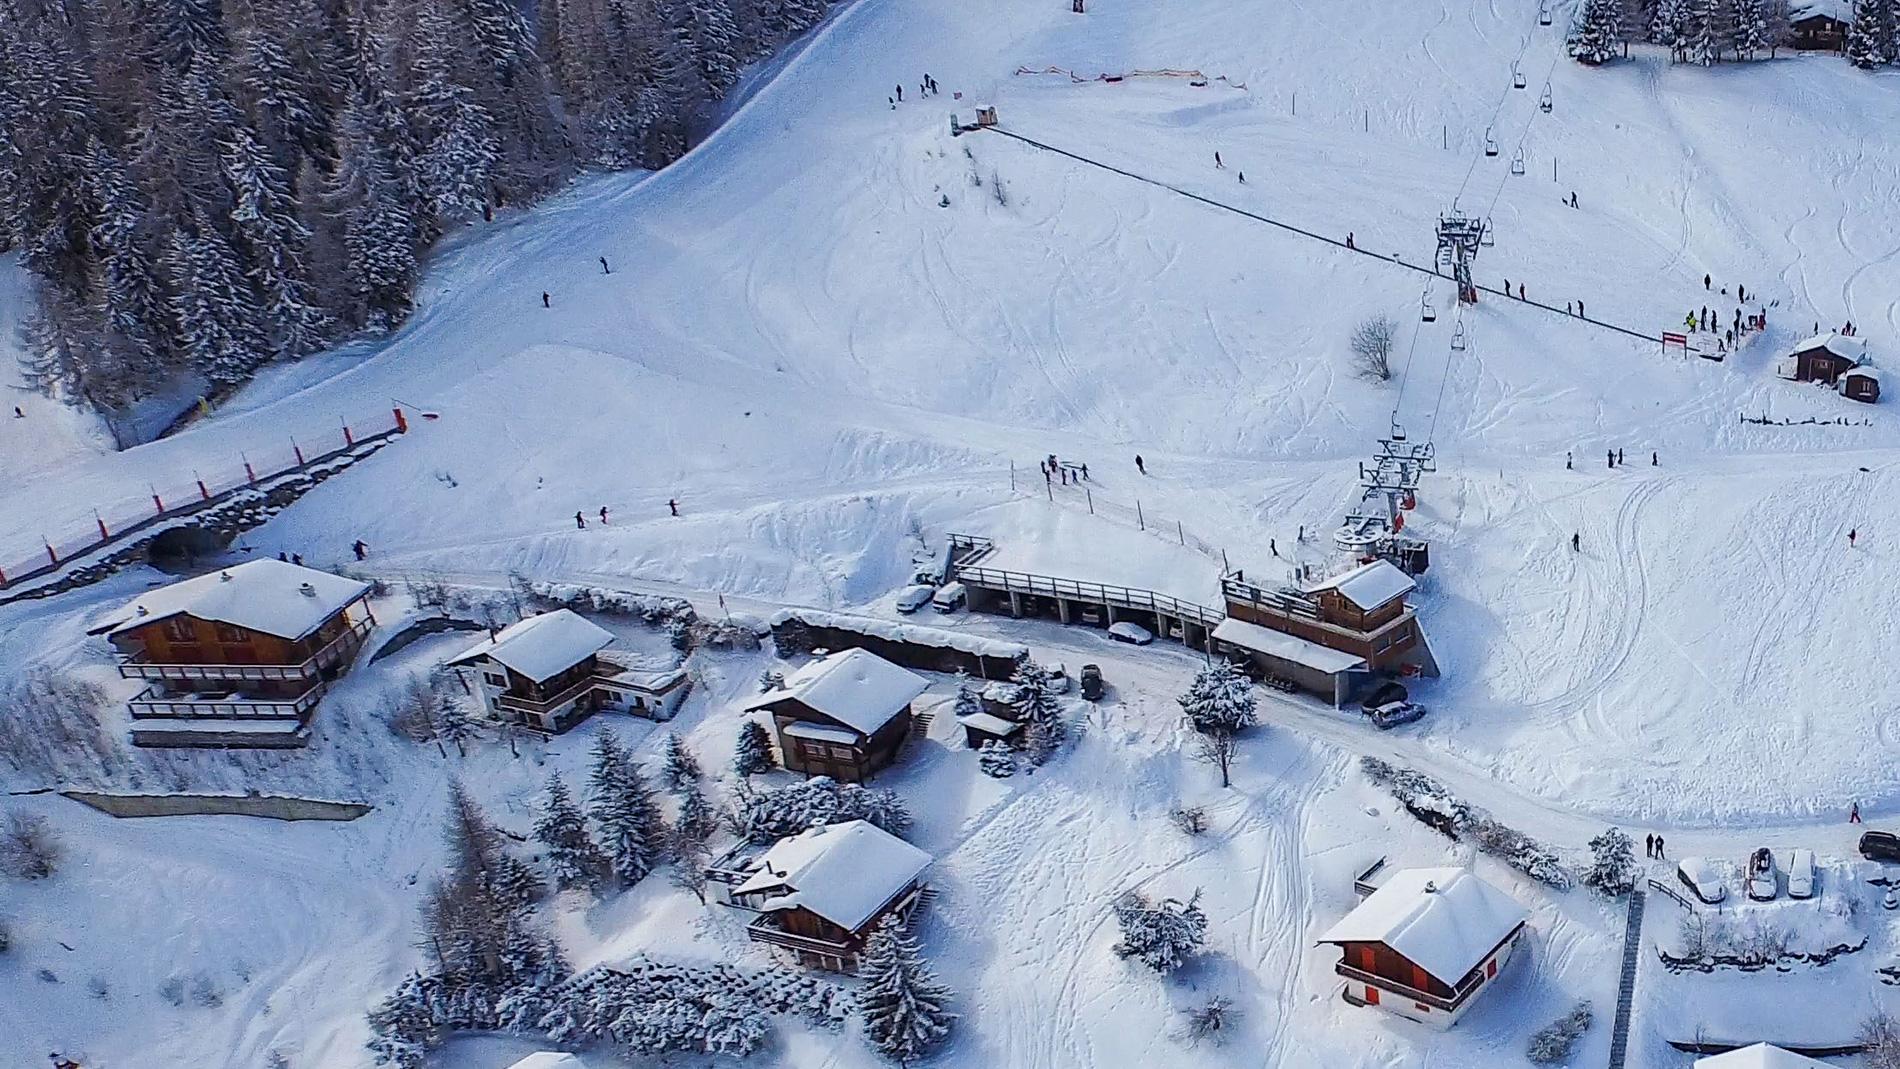 Chalet Enfants du Paradis Chalet, Switzerland